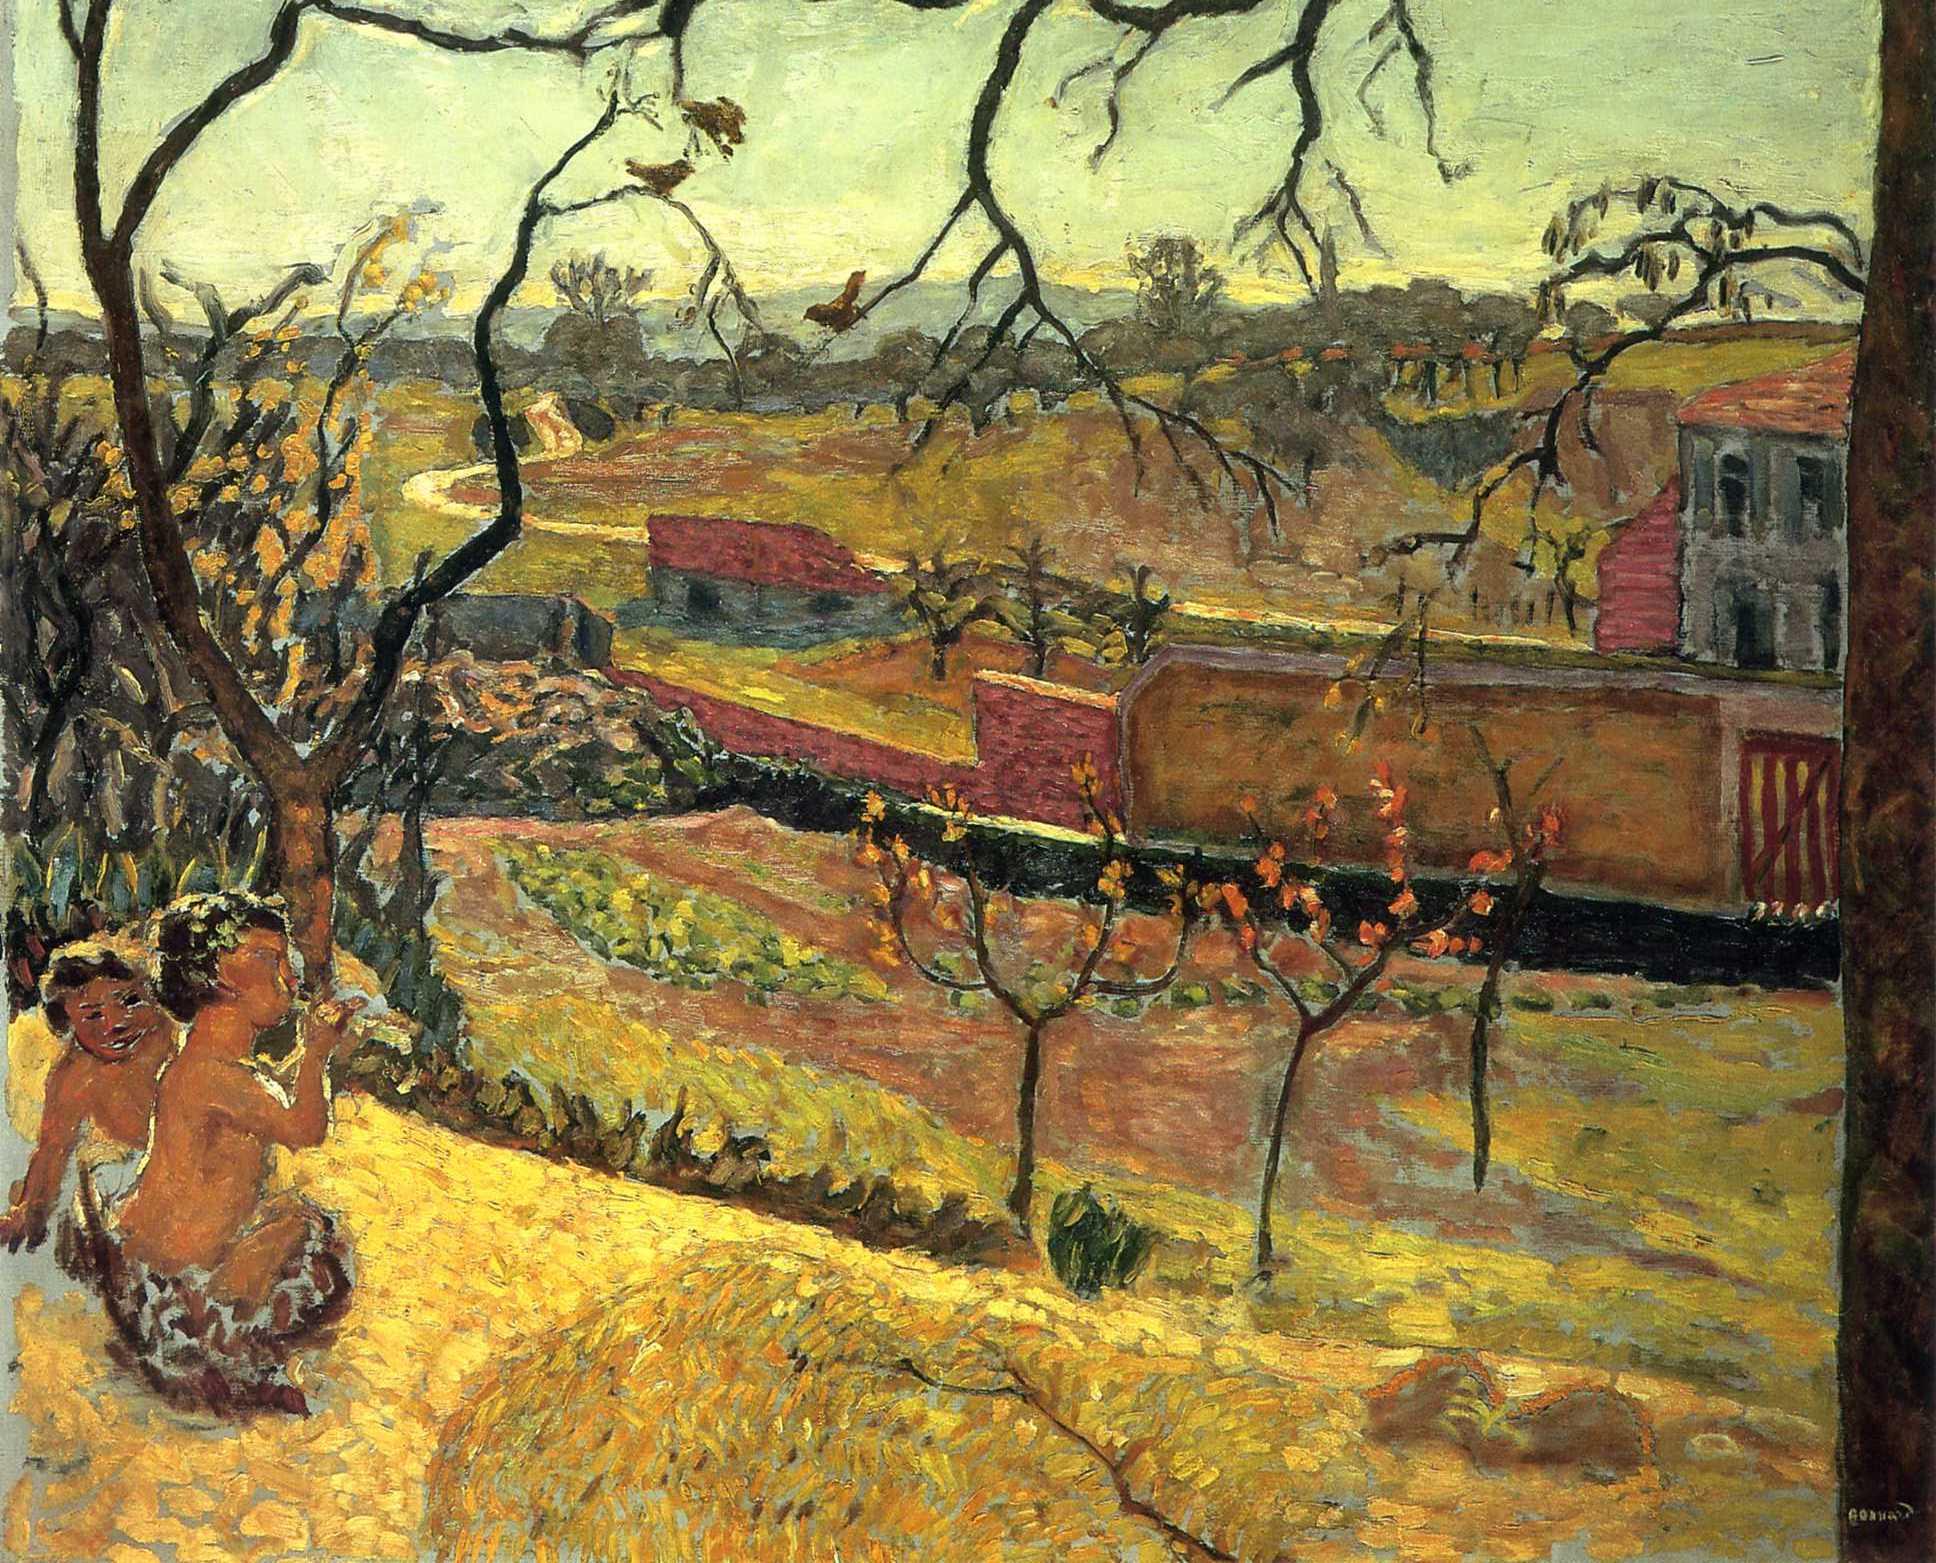 Early Spring (Little Fauns), Pierre Bonnard · 1909